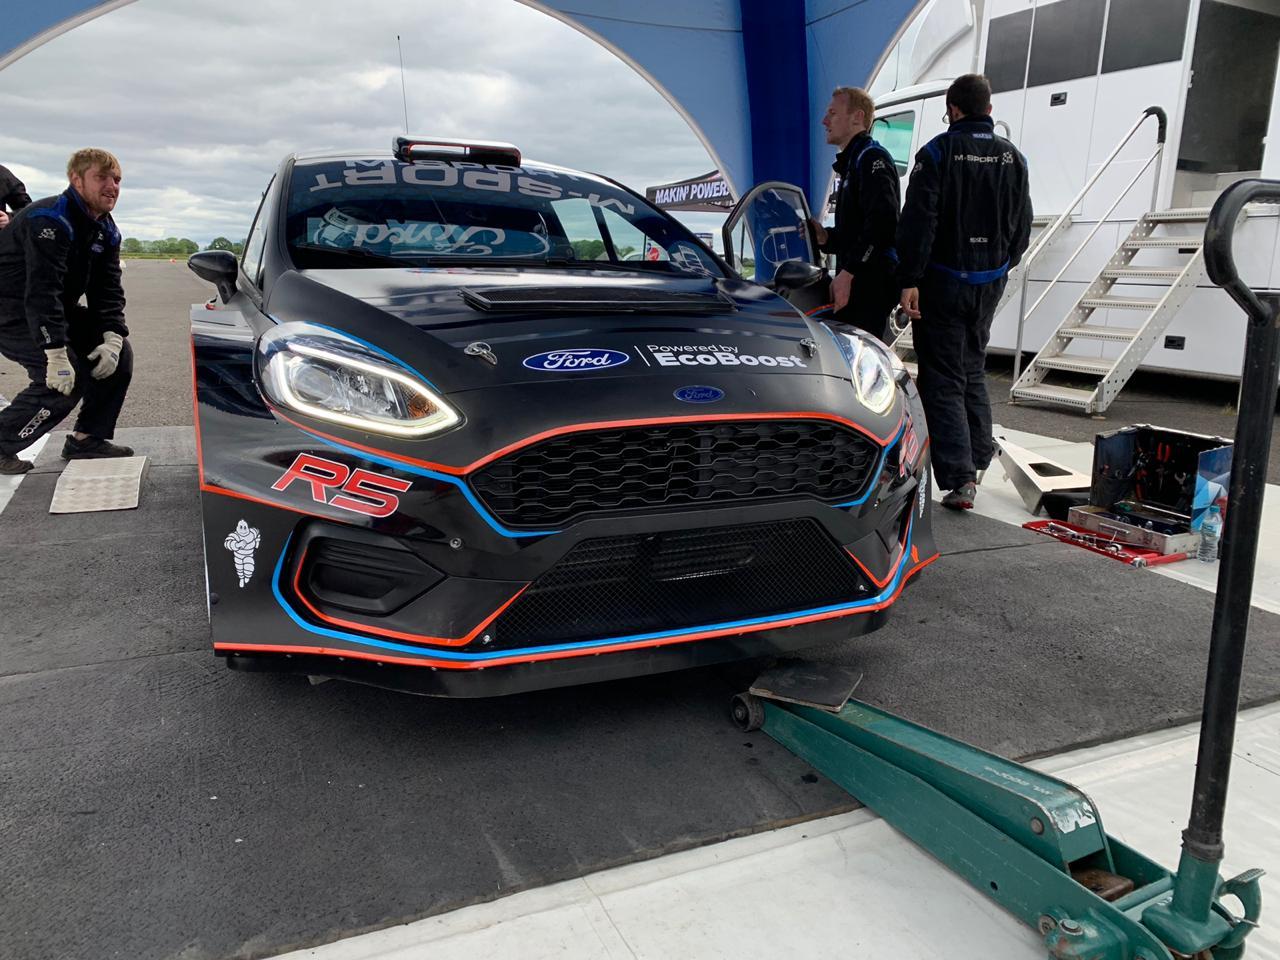 World Rally Championship: Temporada 2019 - Página 26 D8yvnffXsAQbst_